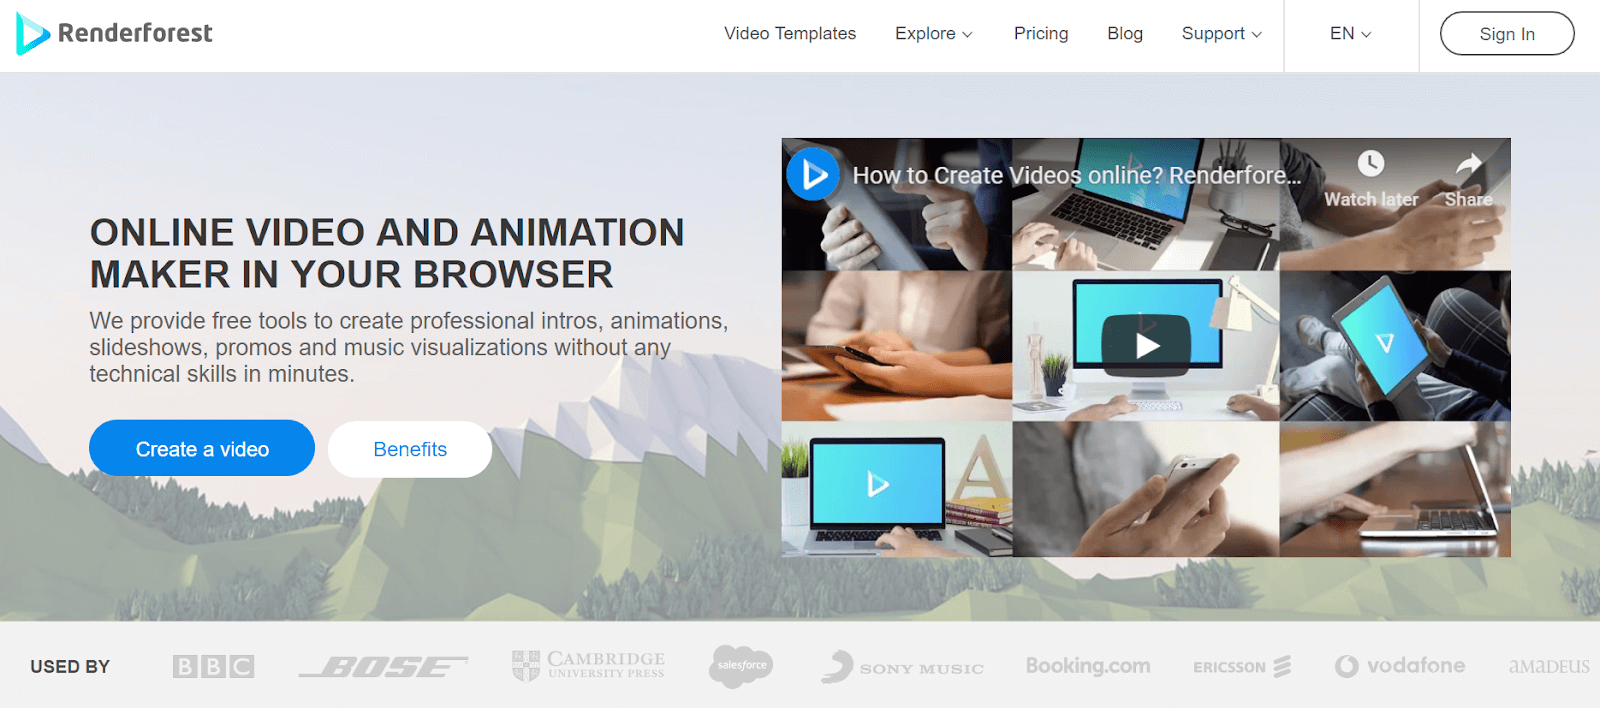 Renderforest Video Marketing Tool